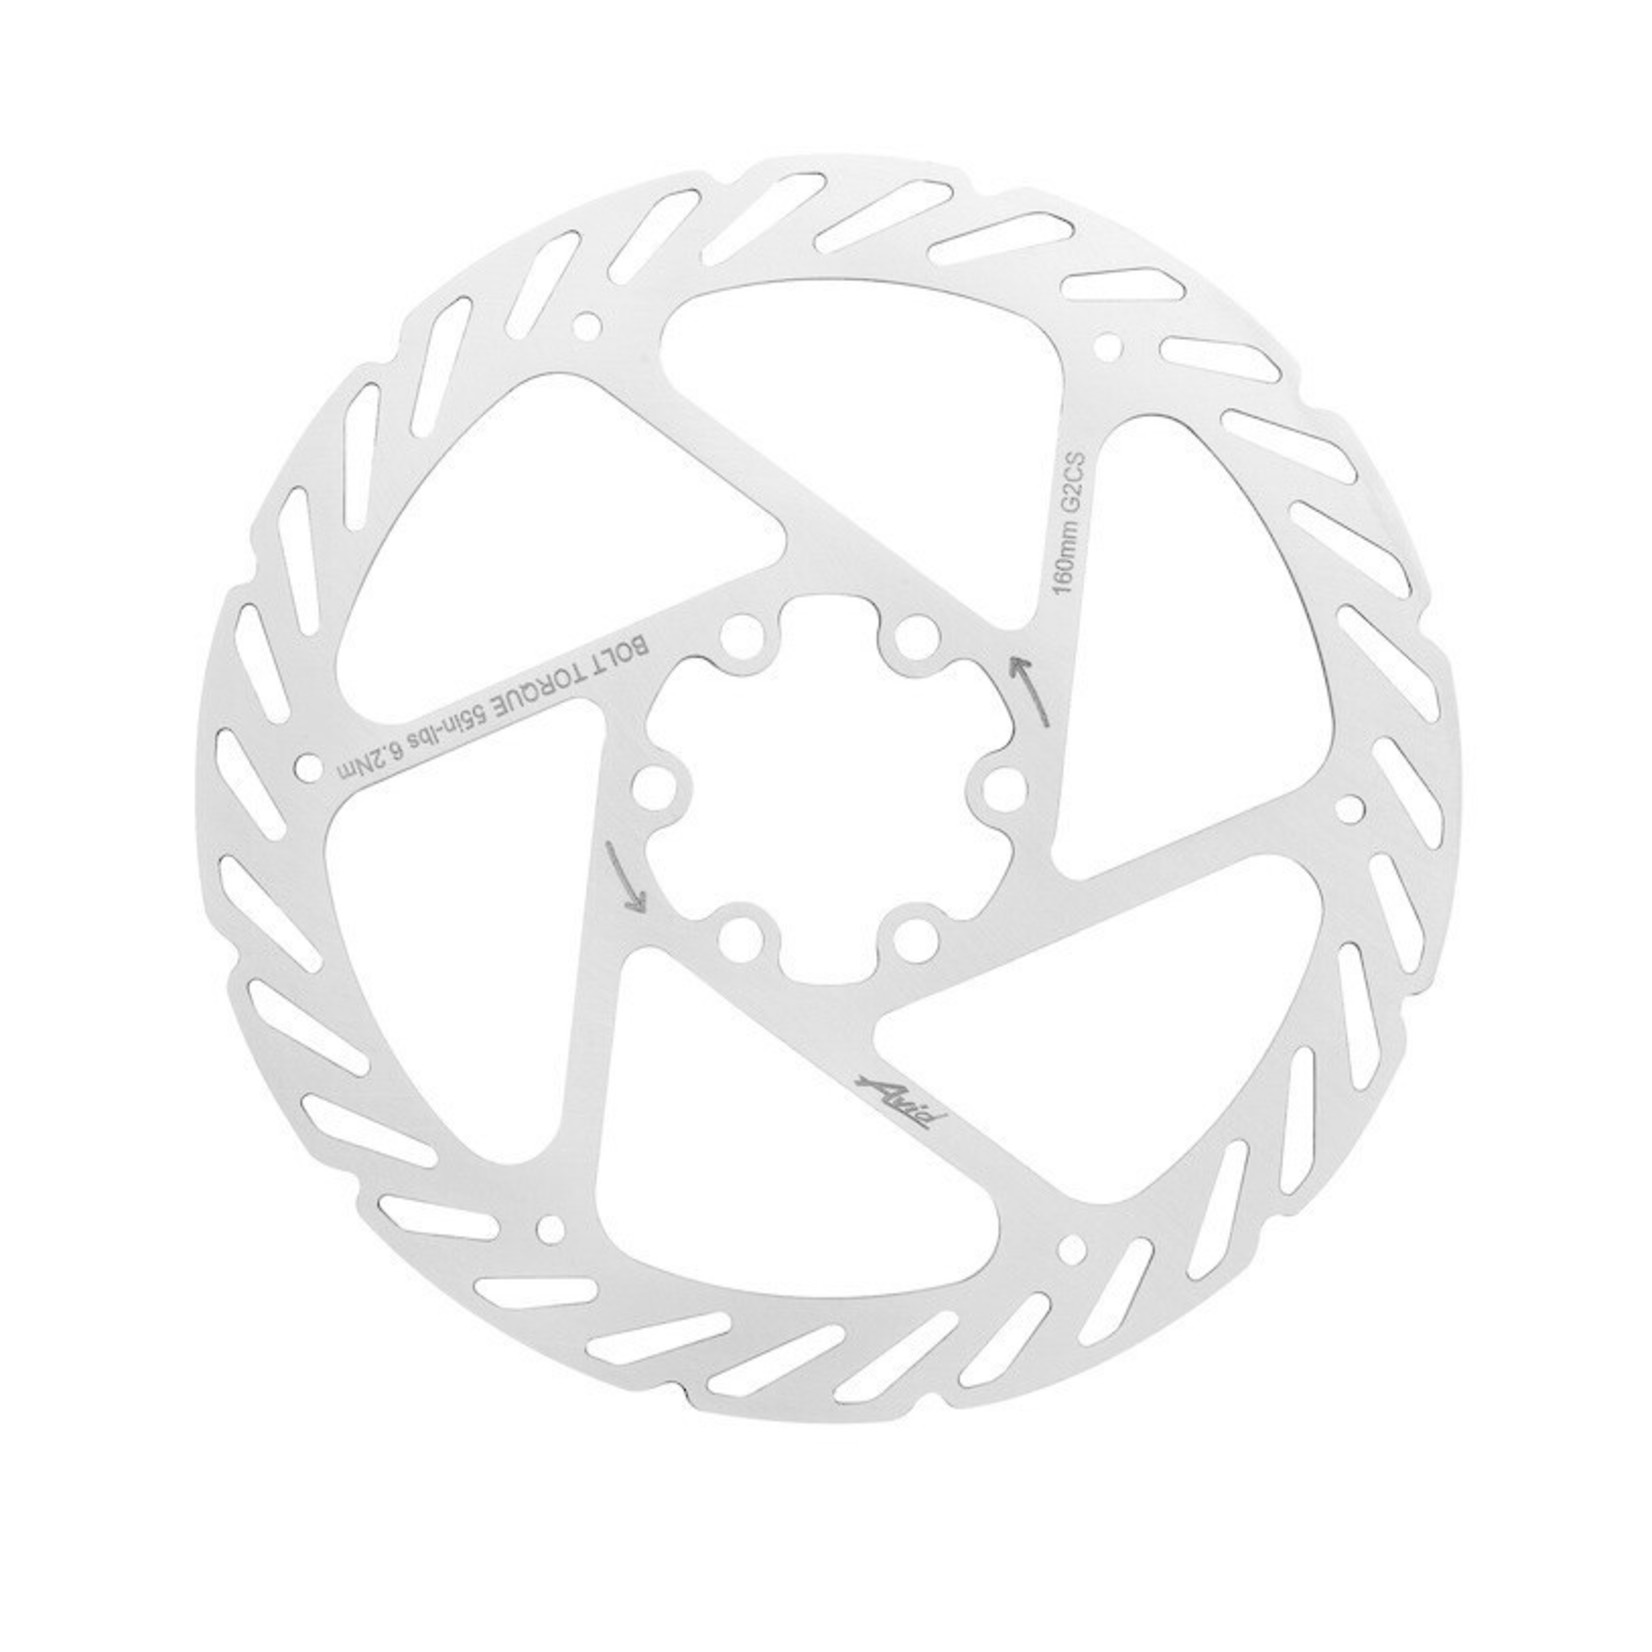 Avid Avid G2 Clean Sweep 180mm Rotor